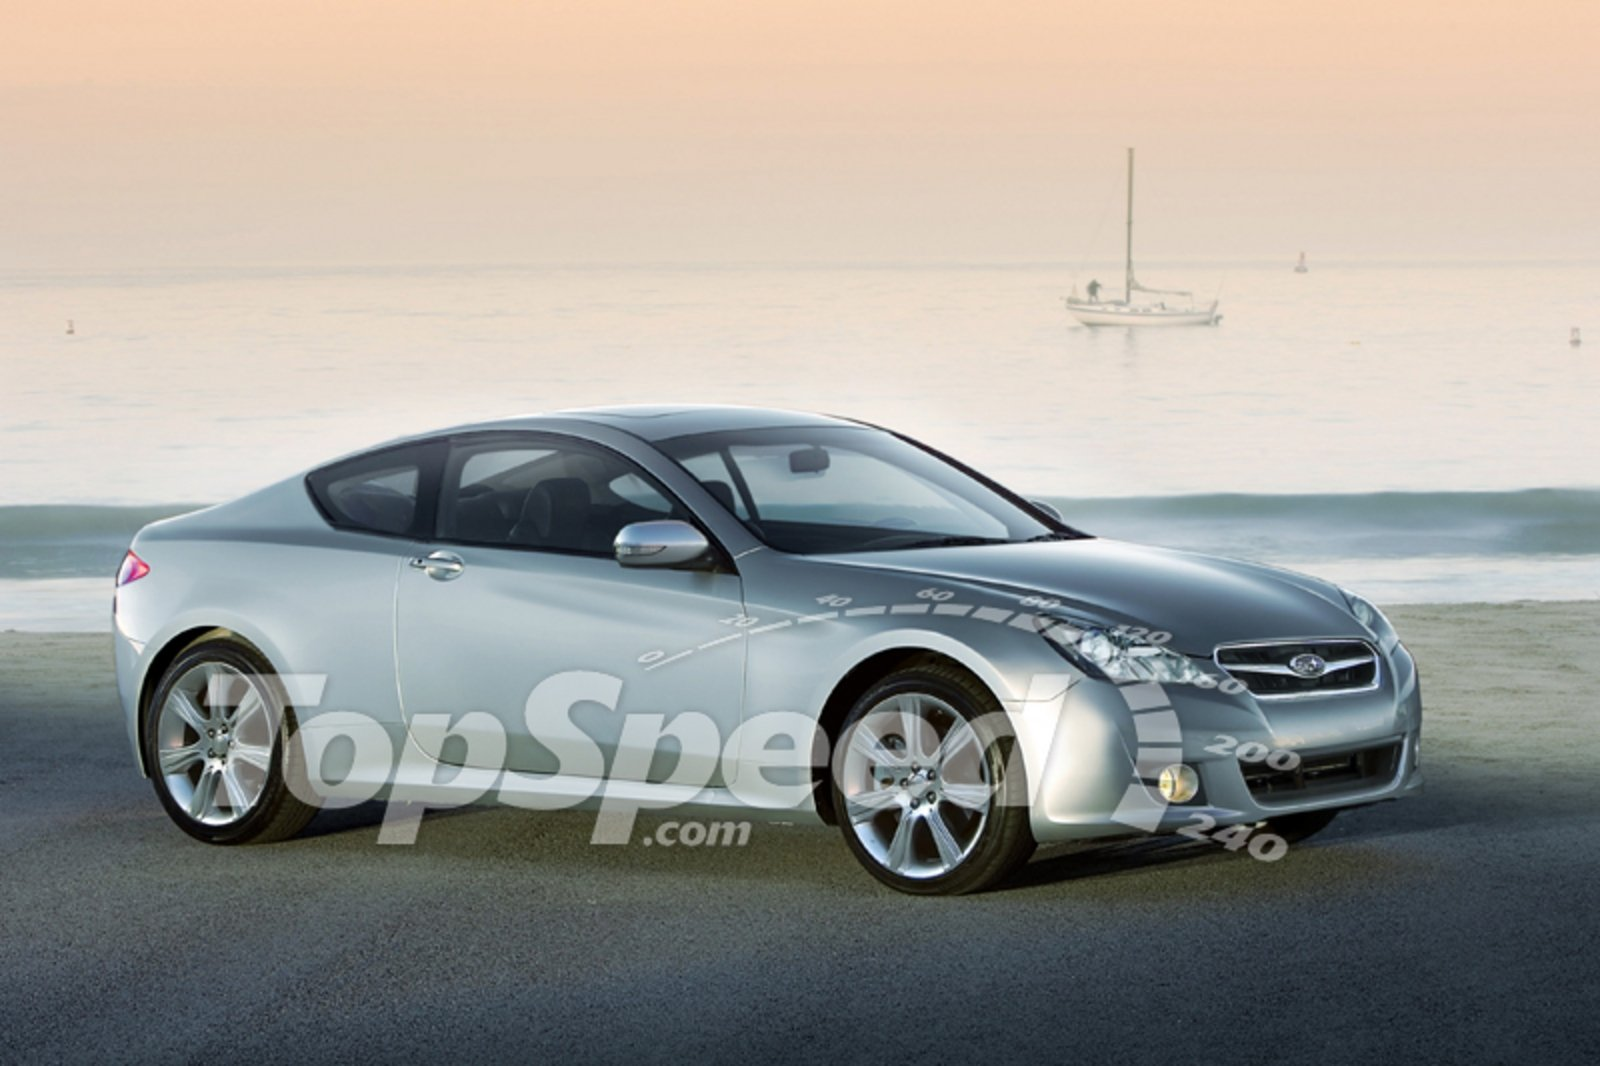 2010 Subaru Rwd Coupe News  Top Speed